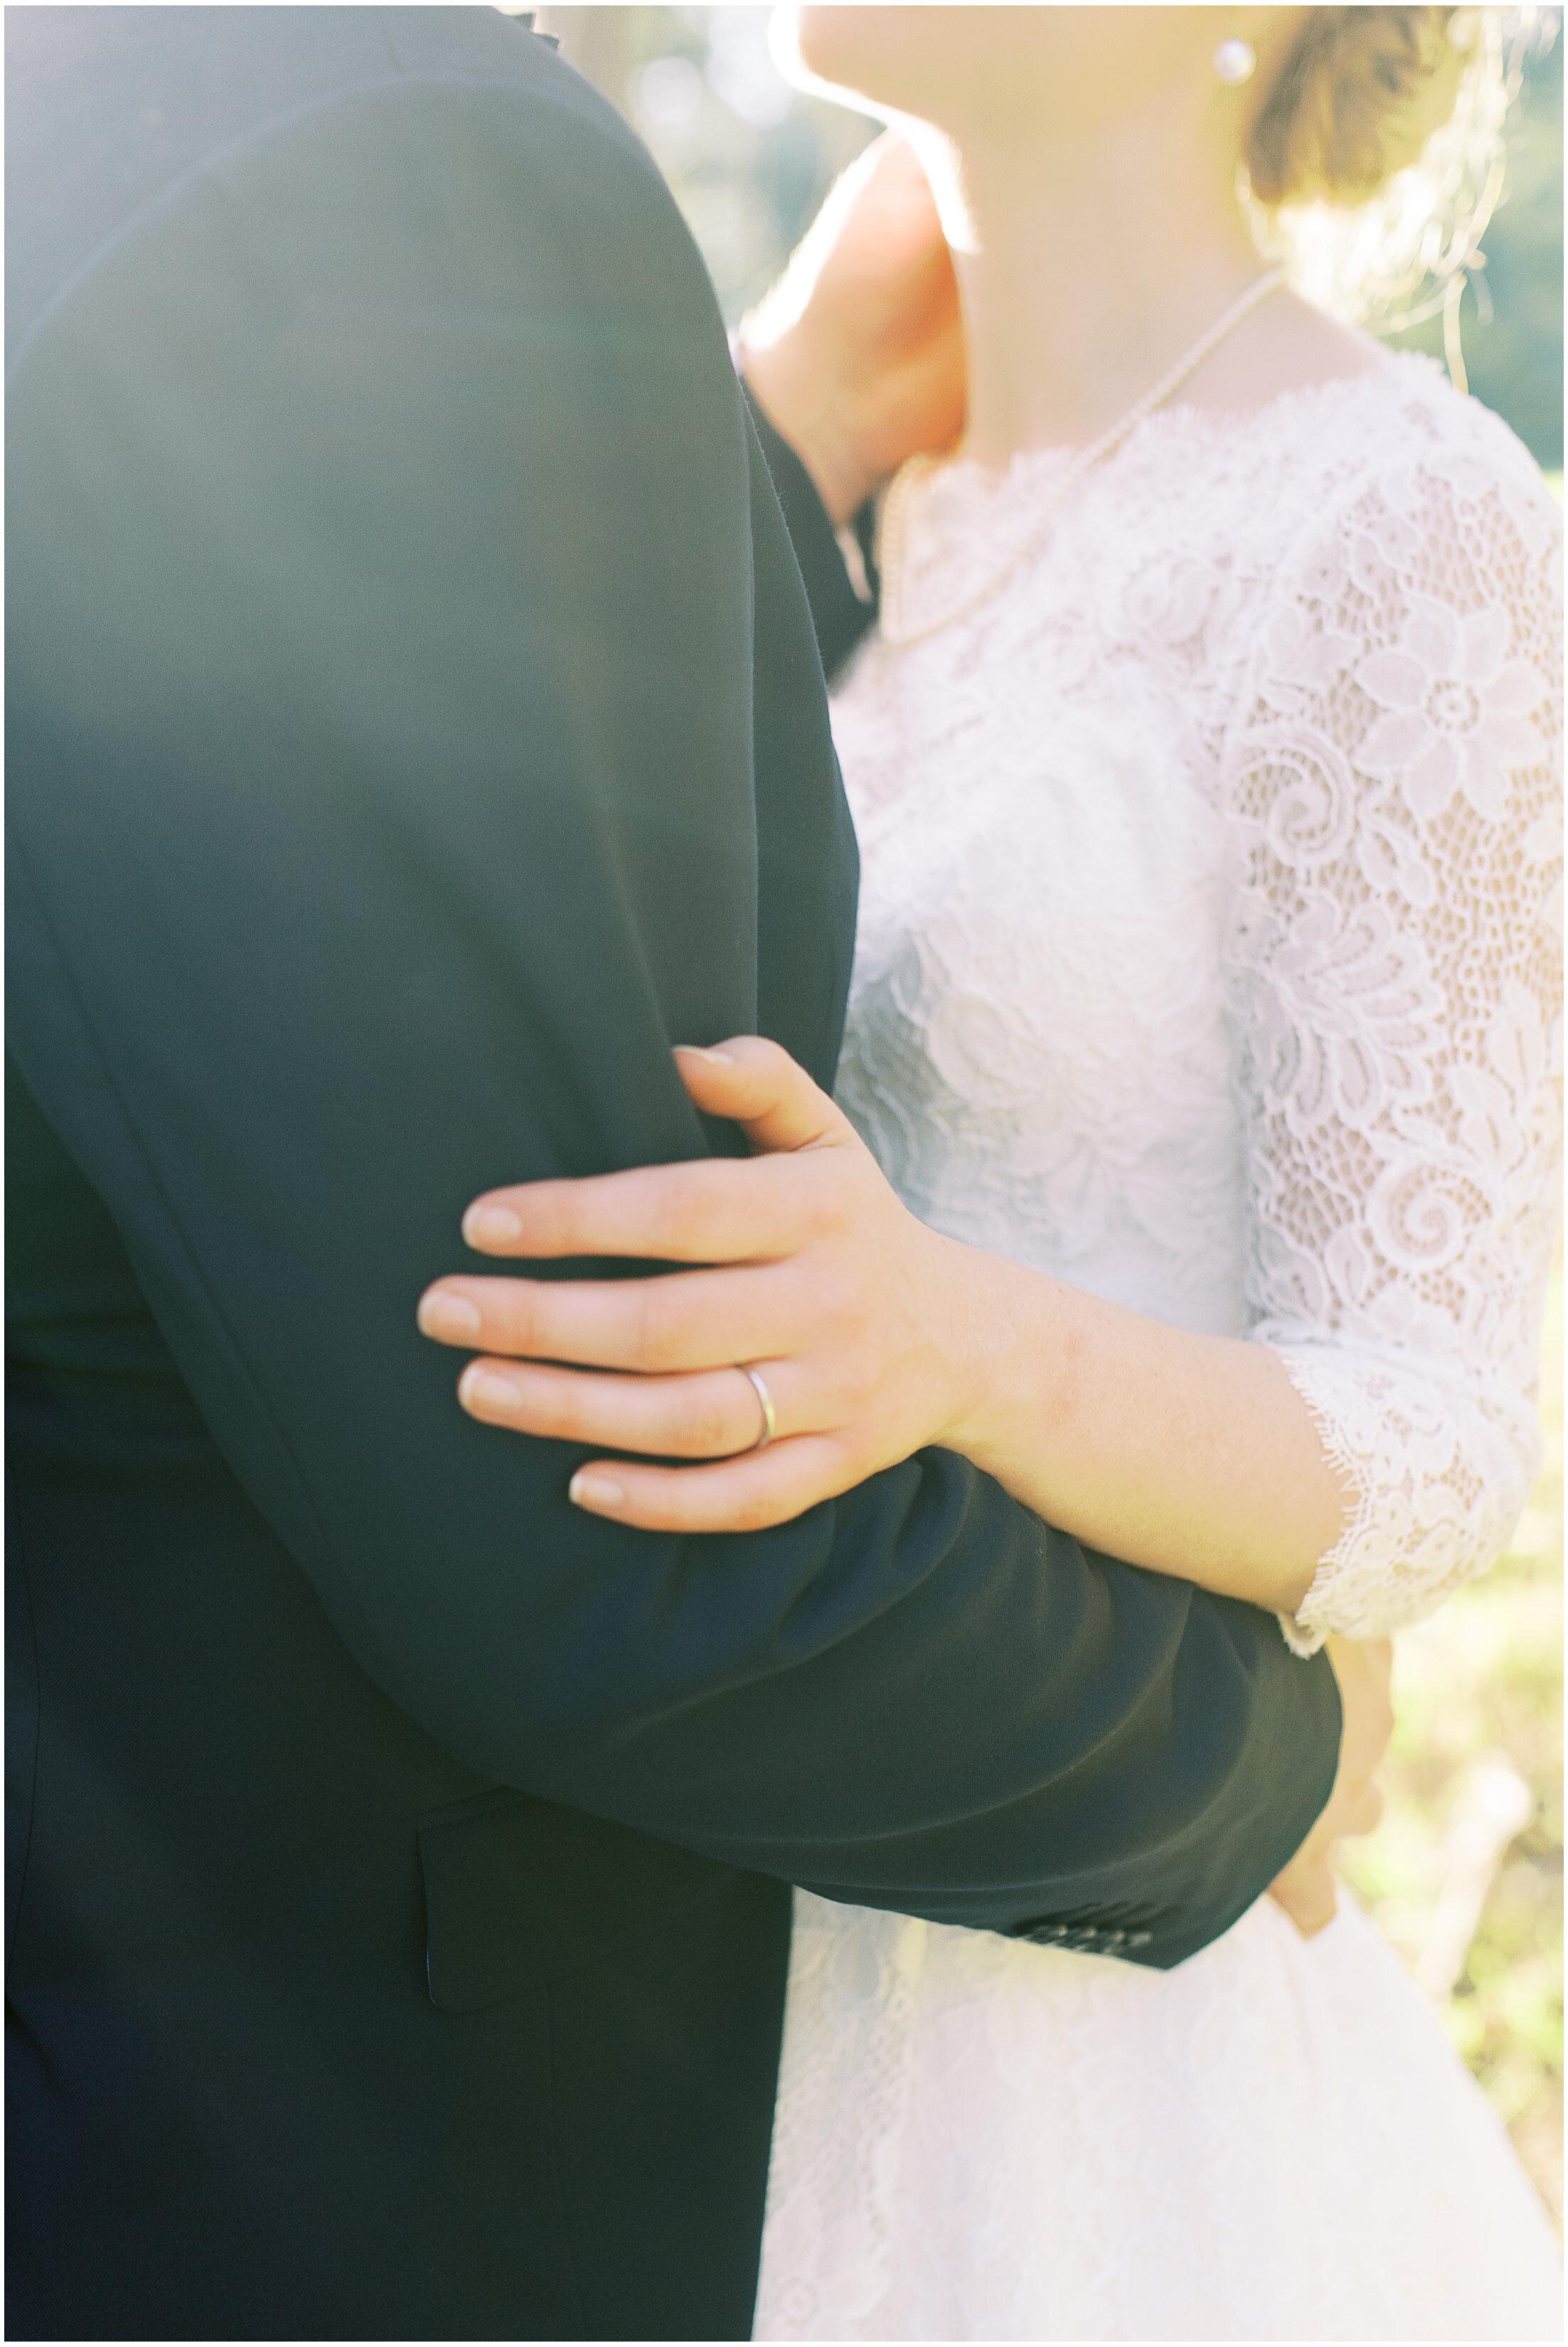 brisbane-fine-art-wedding-photographer-lauren-olivia-luxury-wedding-australia-32.jpg